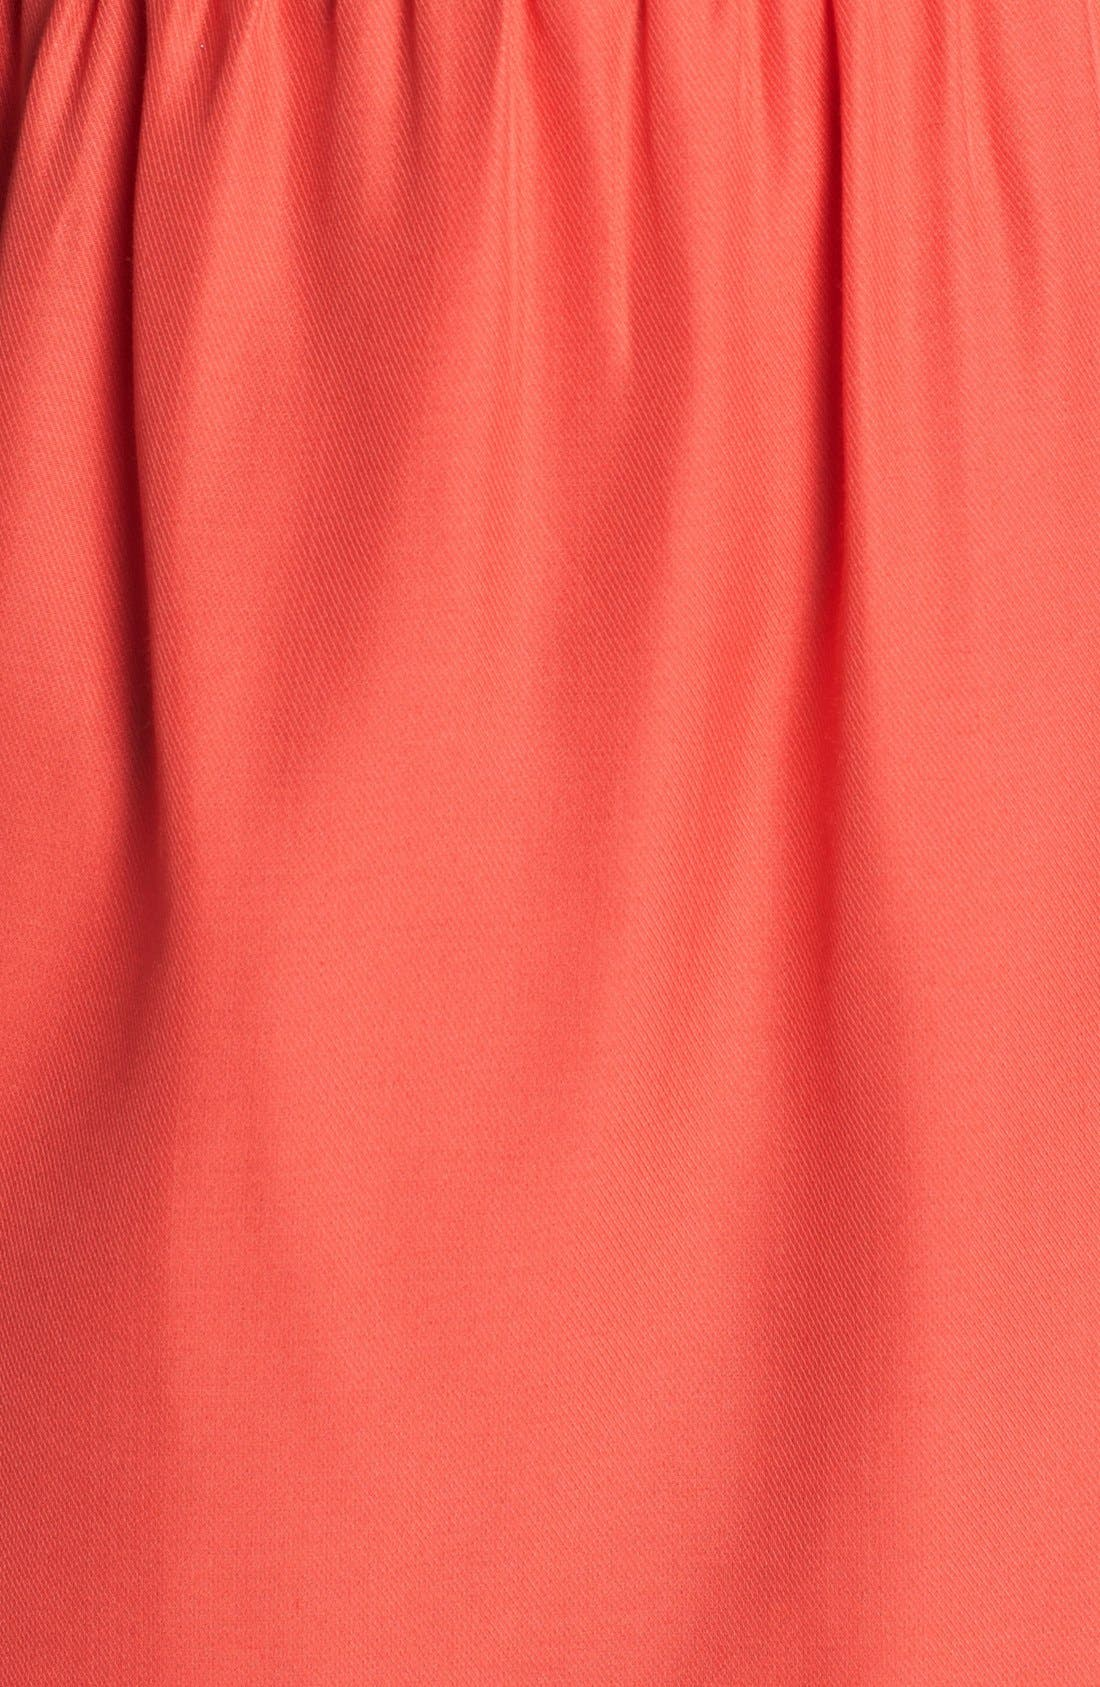 Alternate Image 3  - Jenny Yoo 'Lulu' Ruffled One-Shoulder Sheath Dress (Online Only)